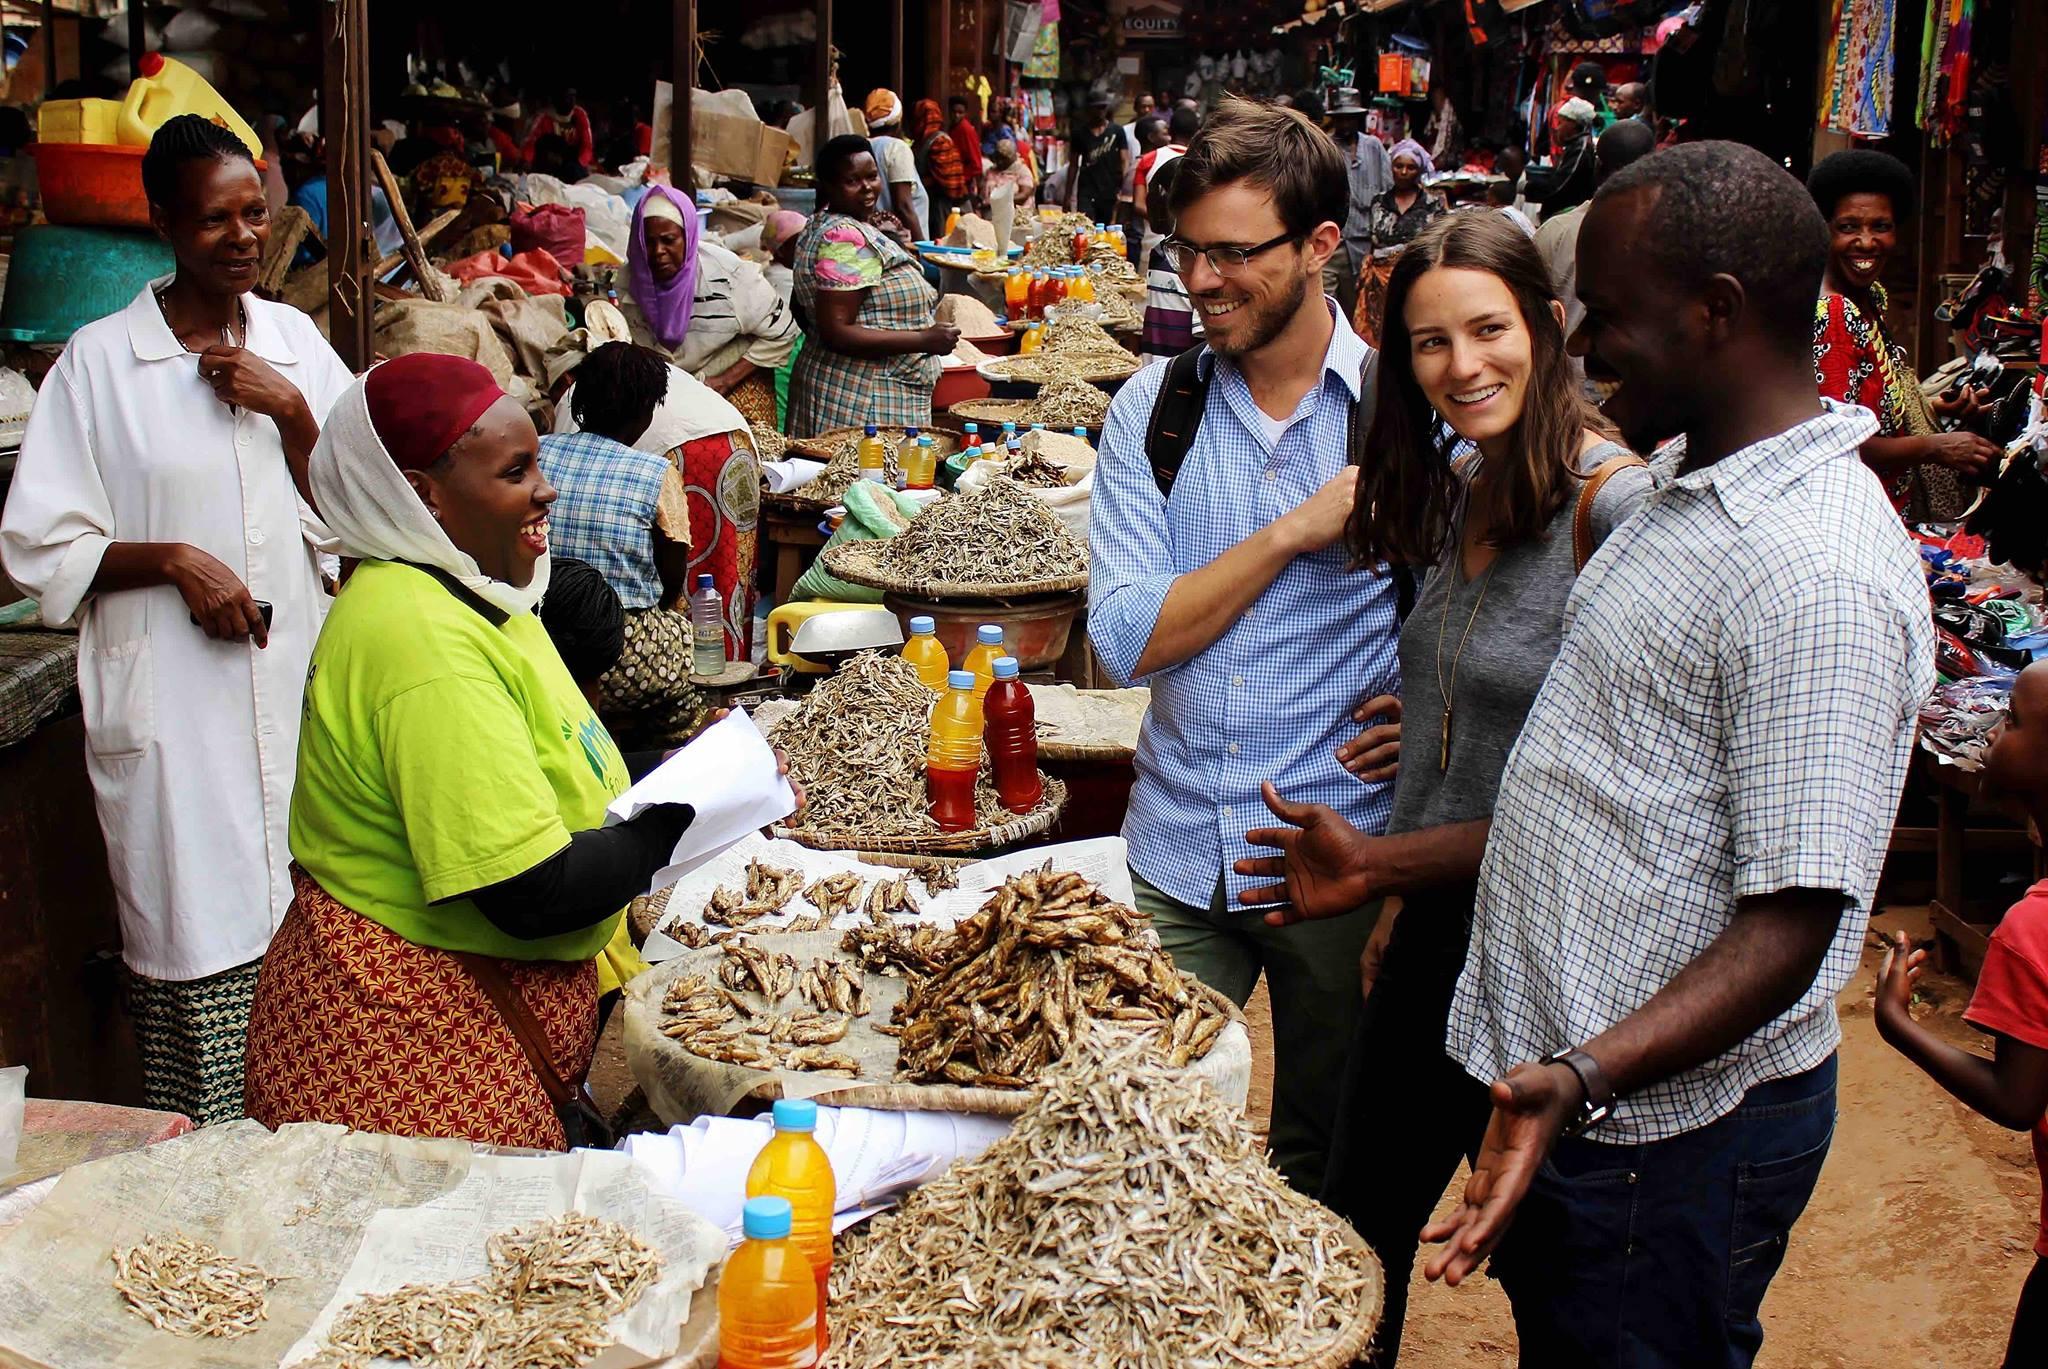 touring the Kigali Market